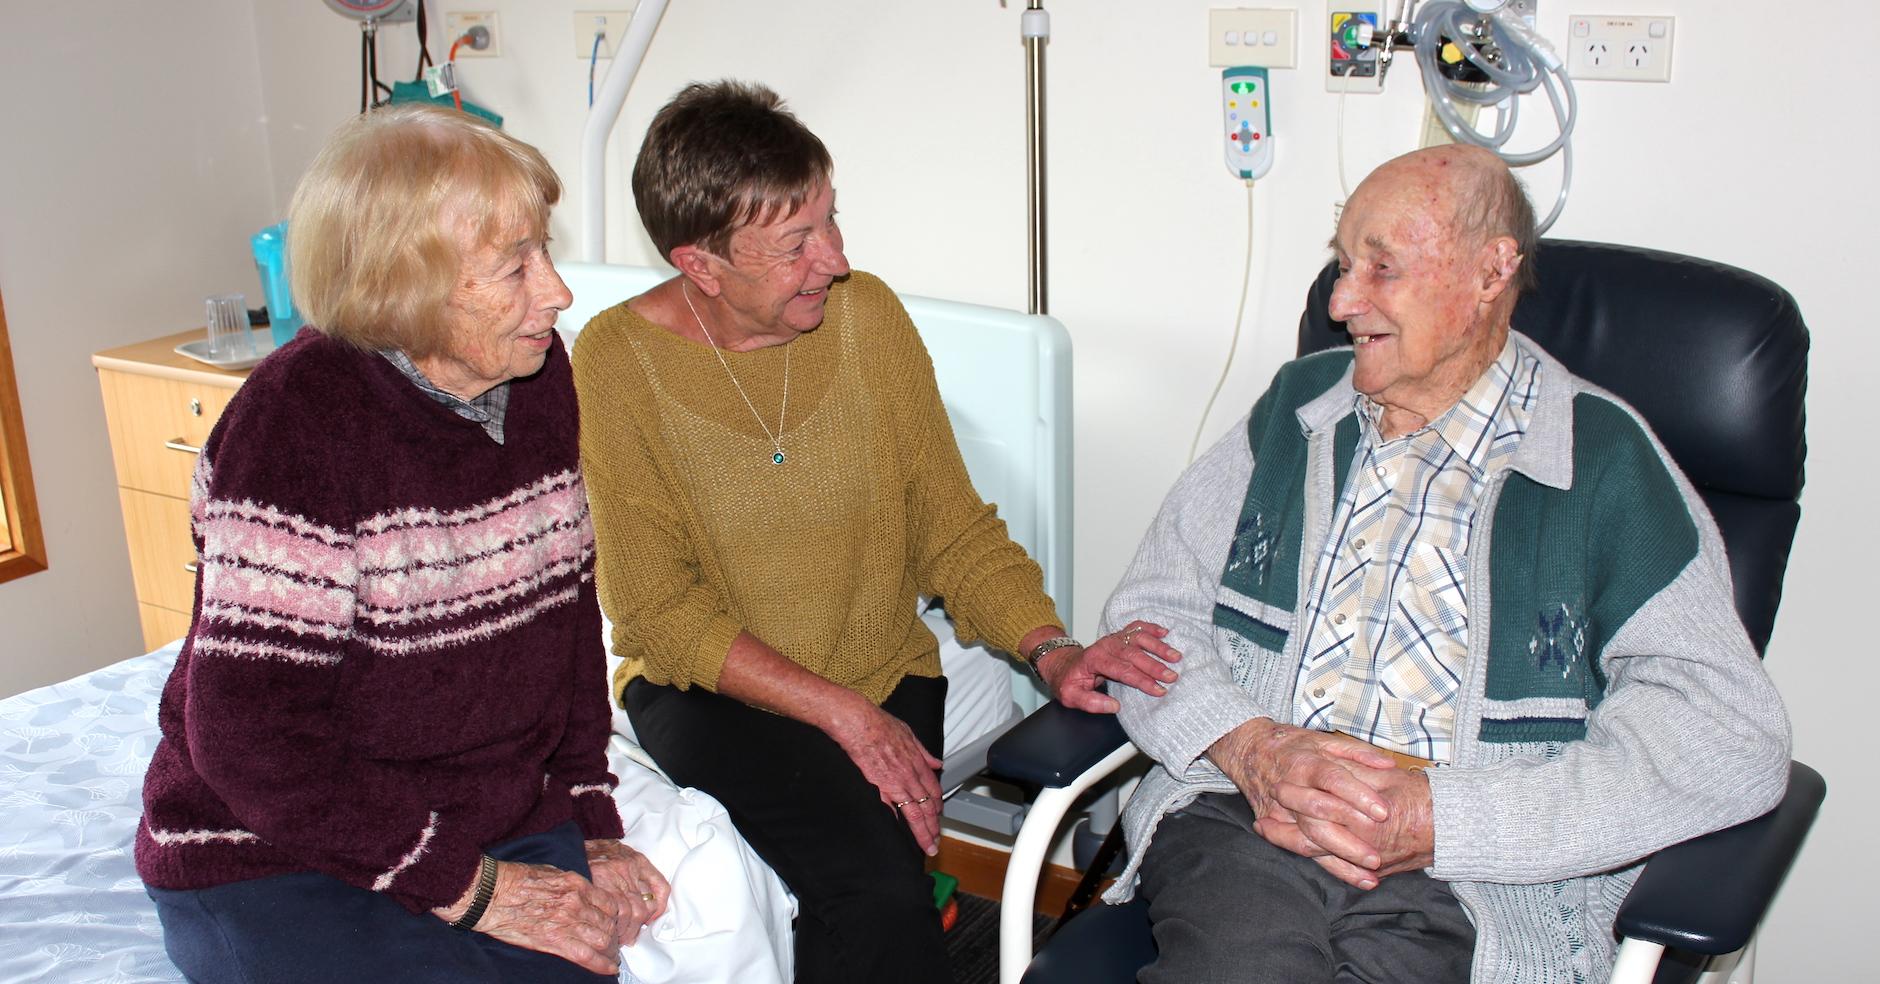 TDHS Respite Care Dorothy Bettens Dennis Bettens Fiona Hanel